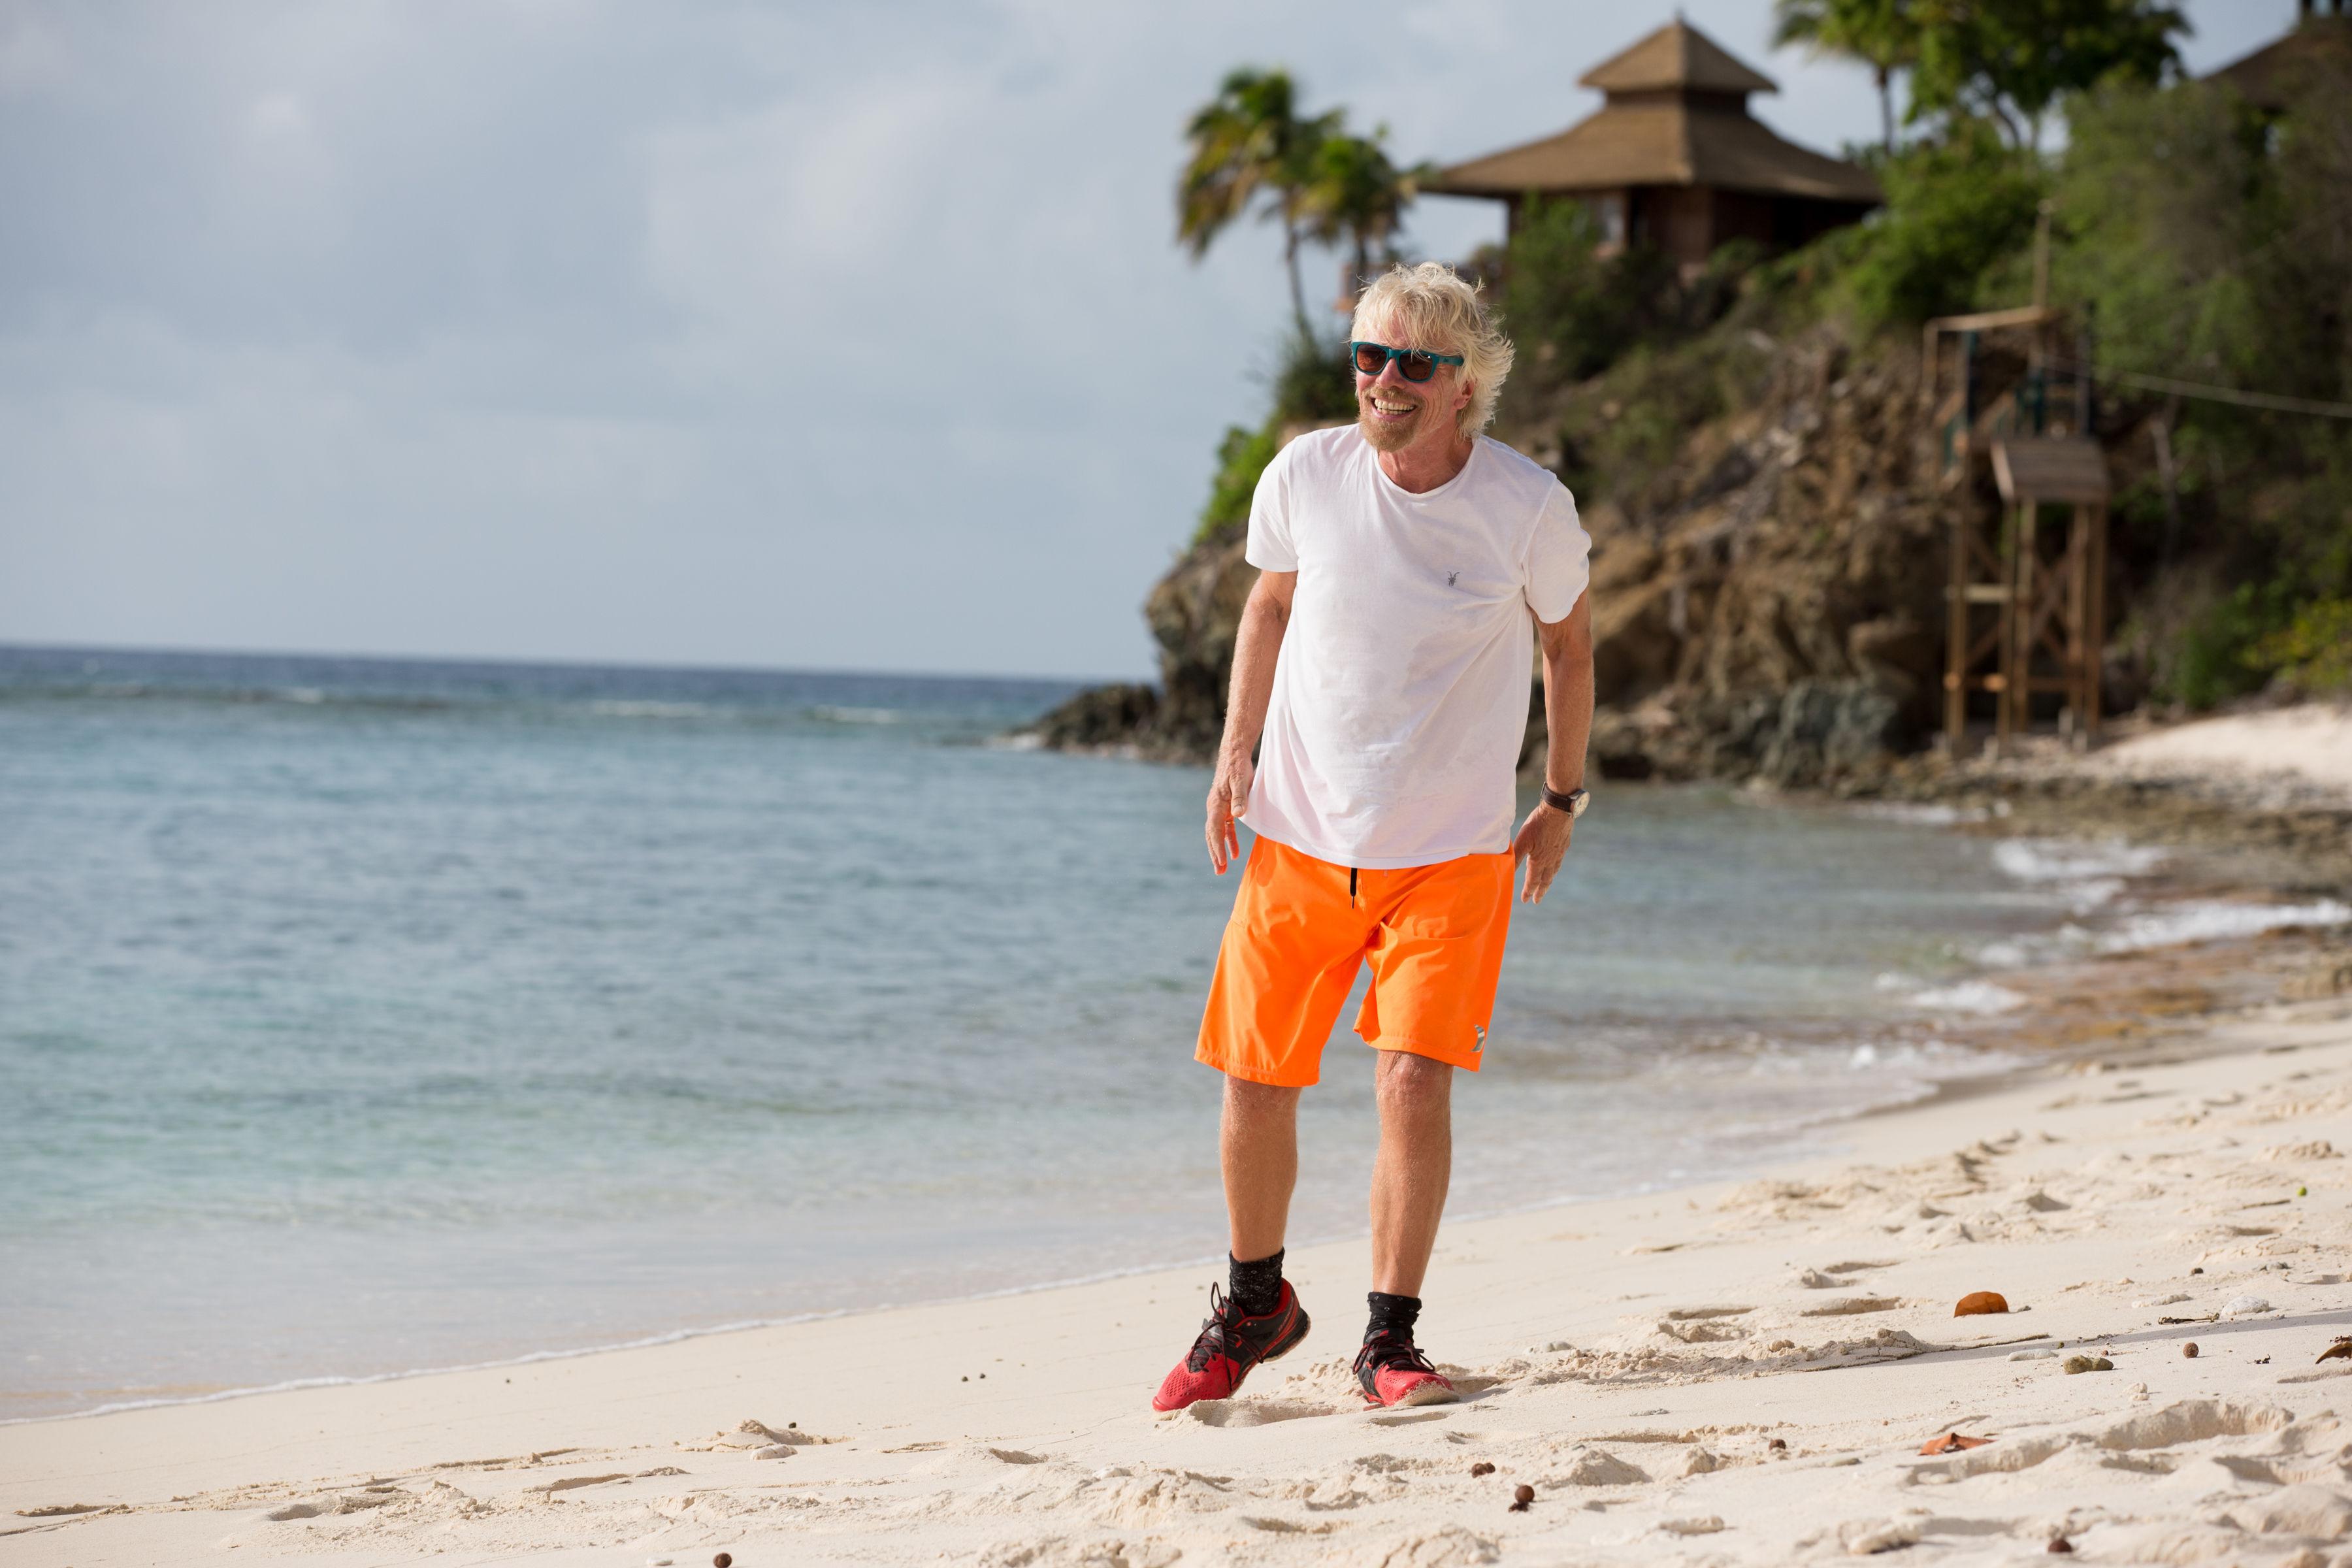 Richard Branson Tens Sunglasses Necker Island